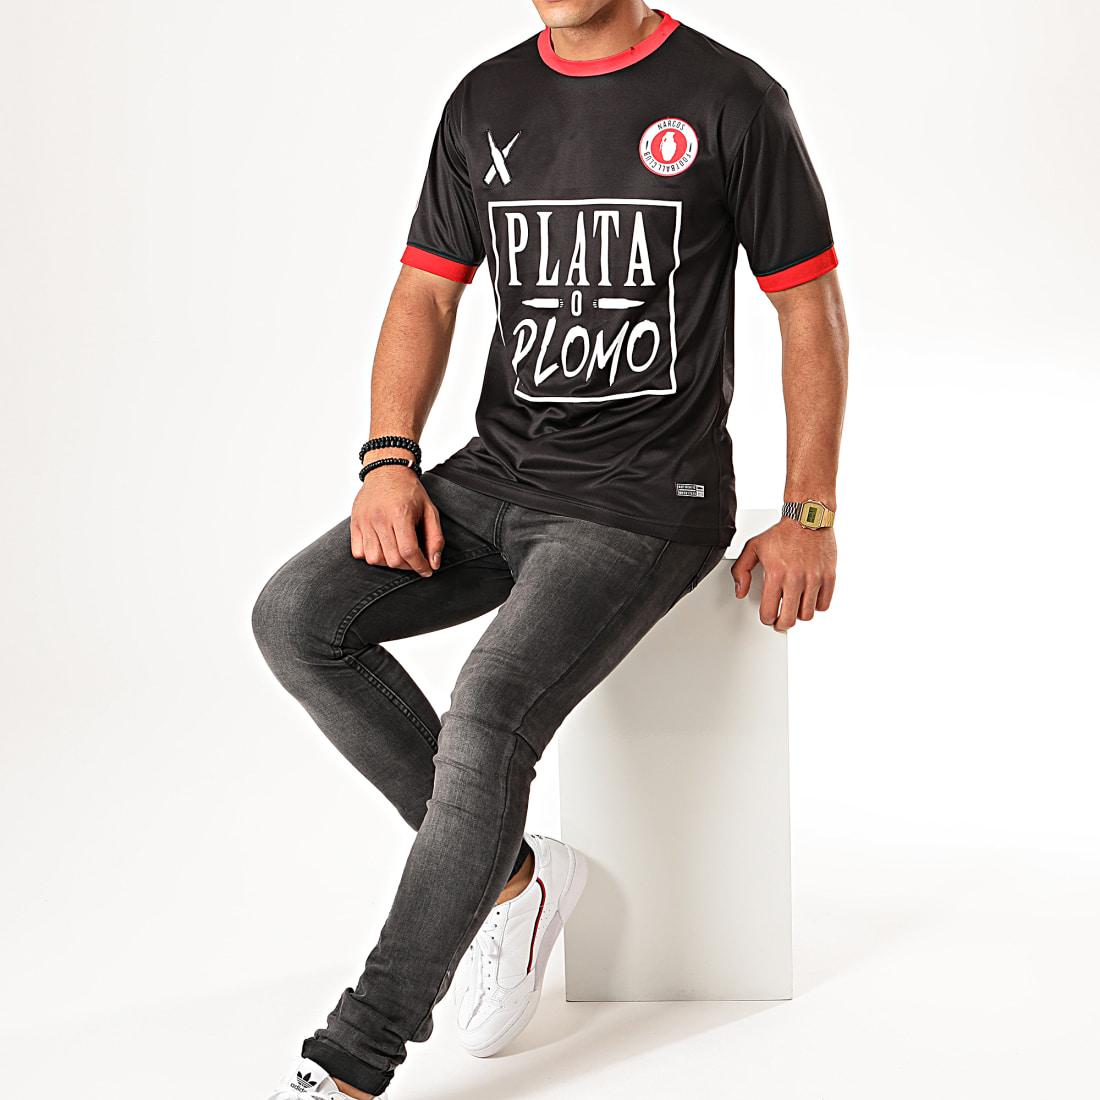 Lacrim Tee Shirt De Sport Plata o Plomo Tunisie Edition